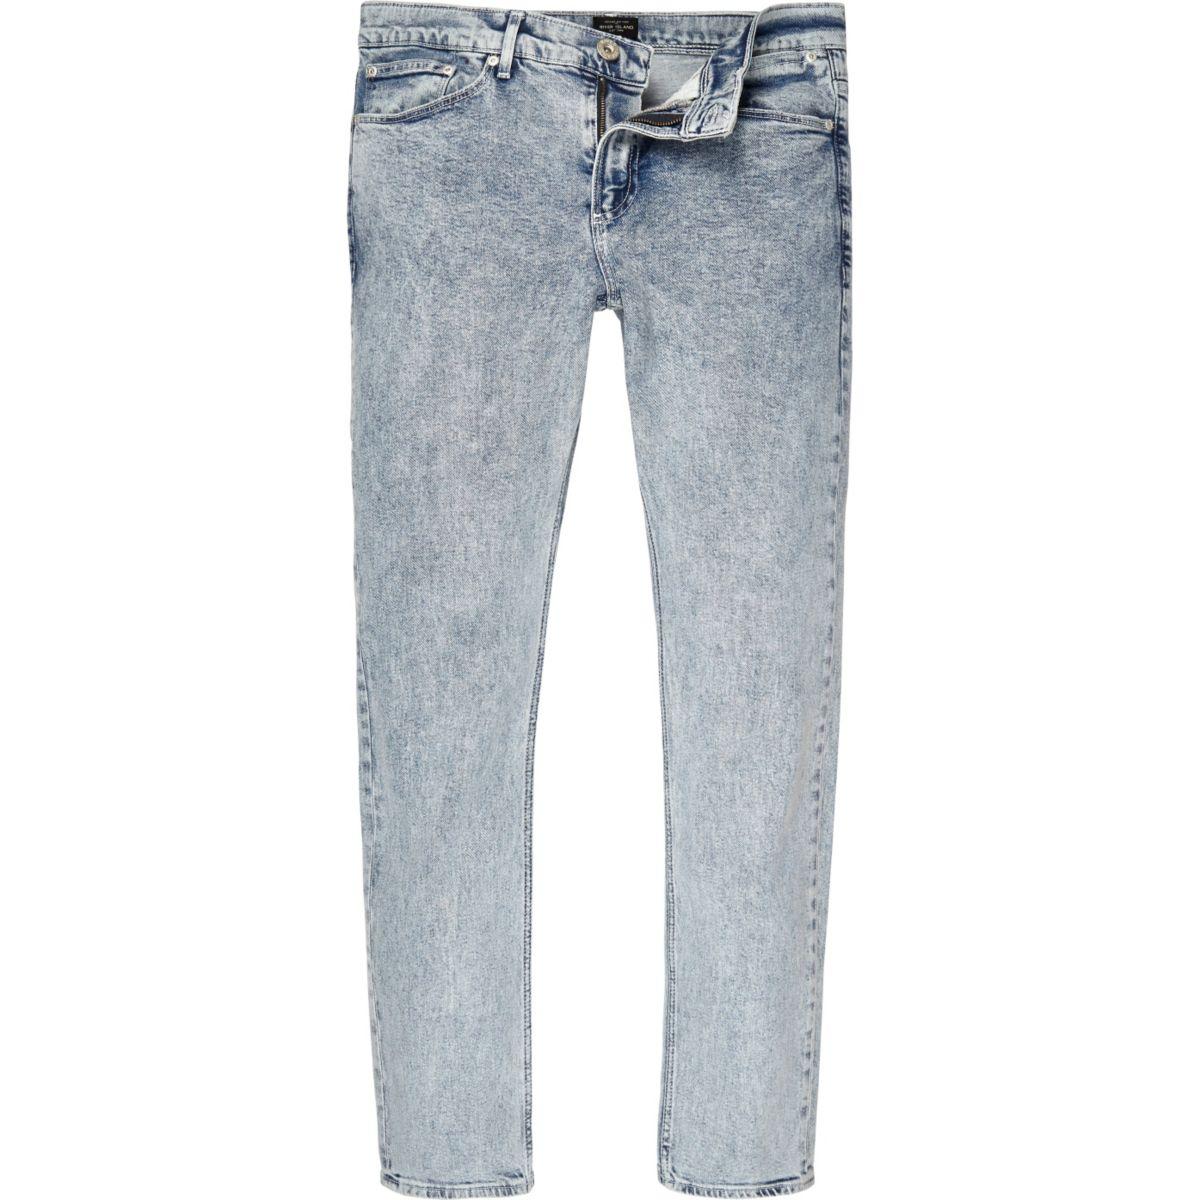 Acid blue wash Sid skinny jeans